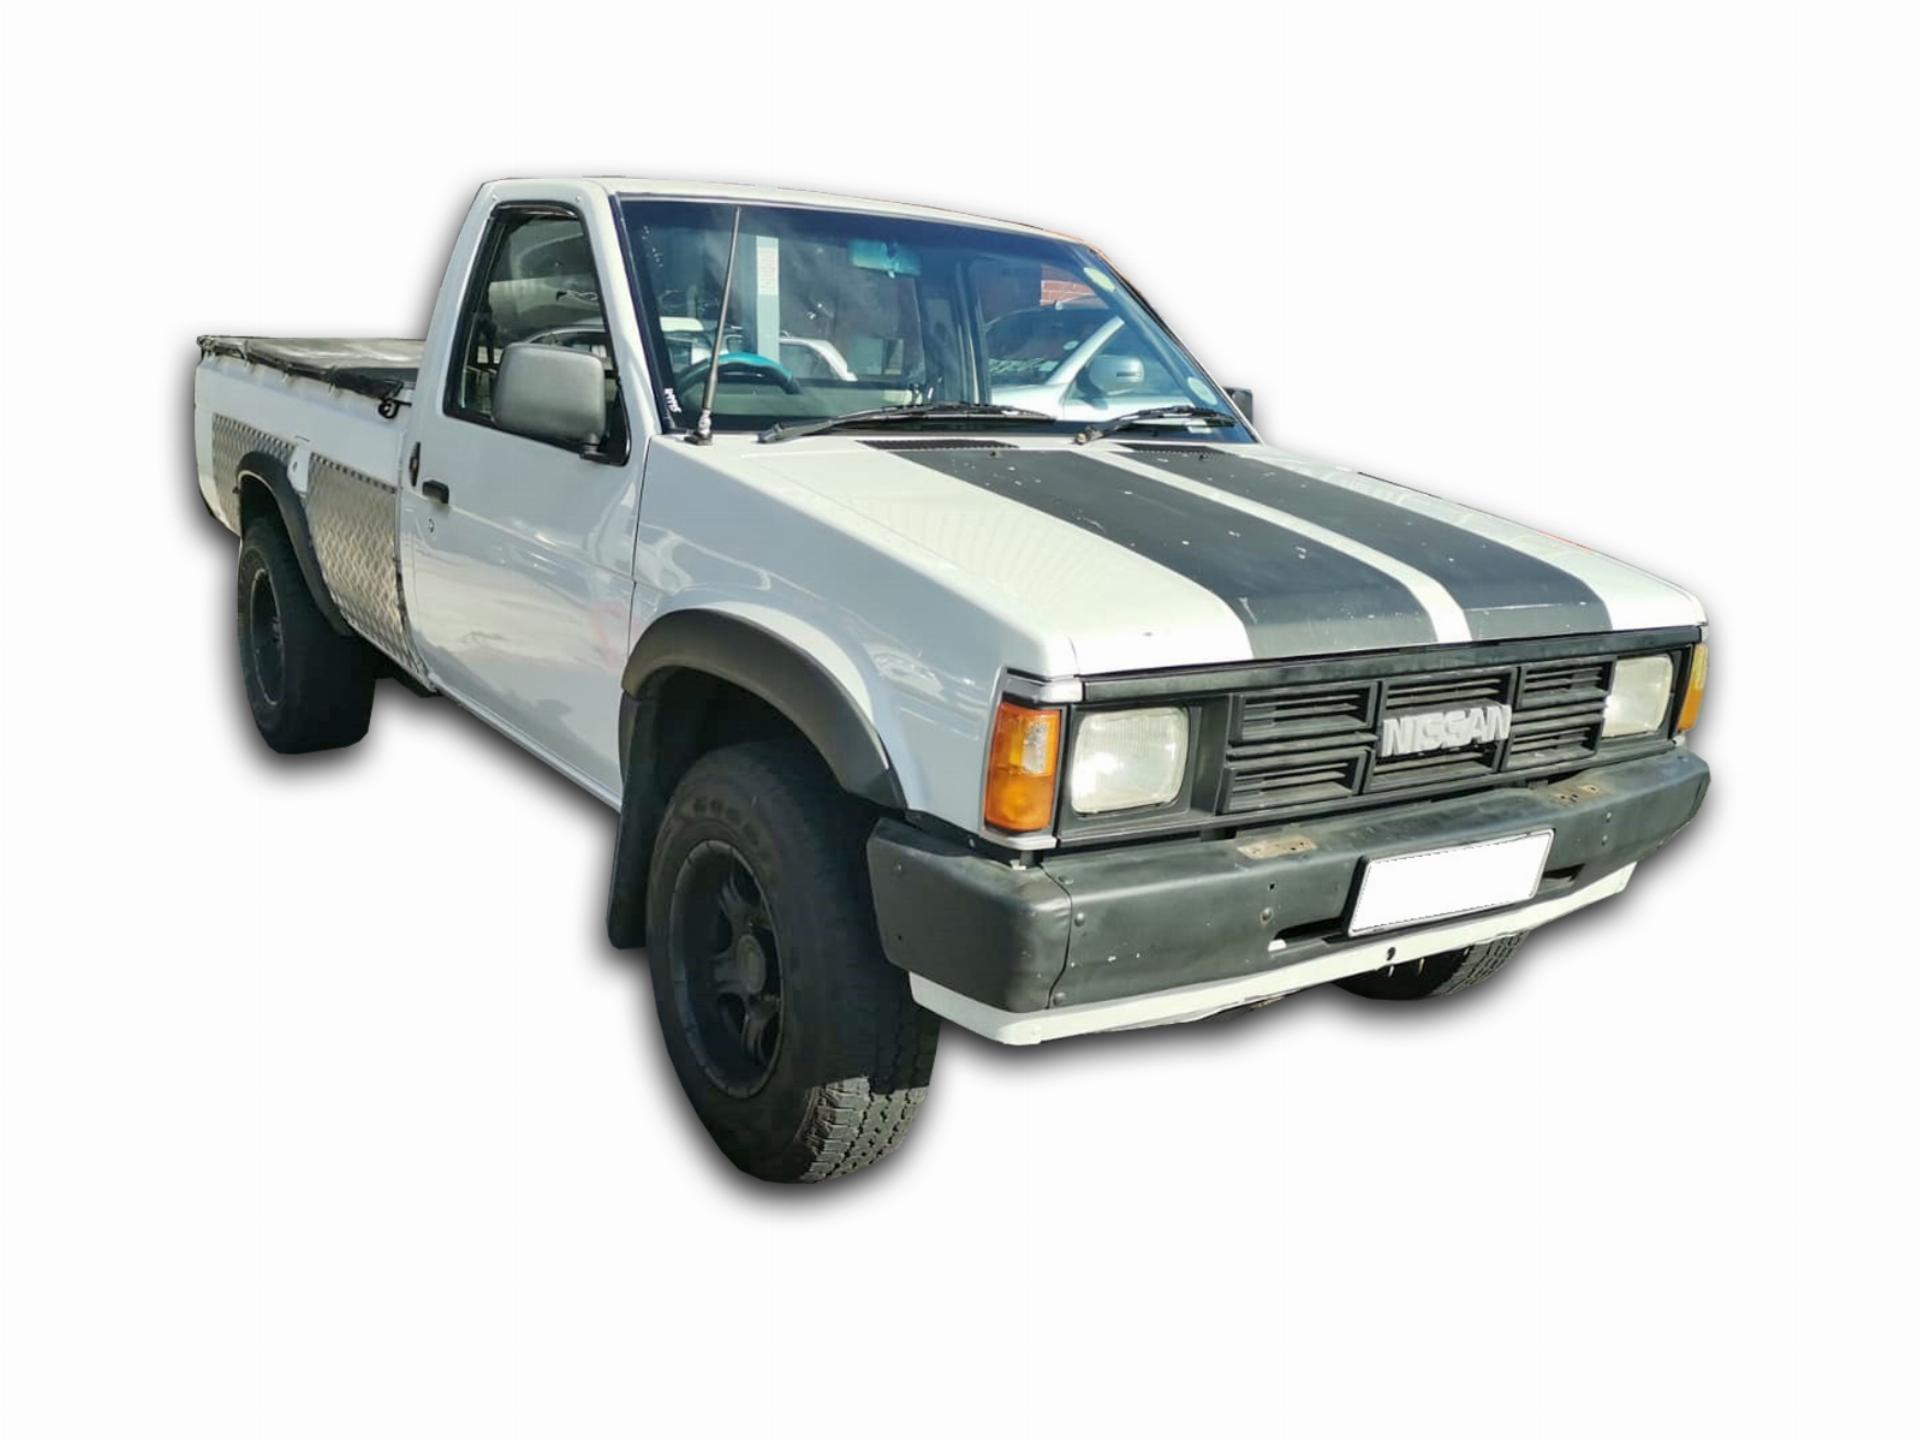 Nissan Hardbody 1.8 Petrol